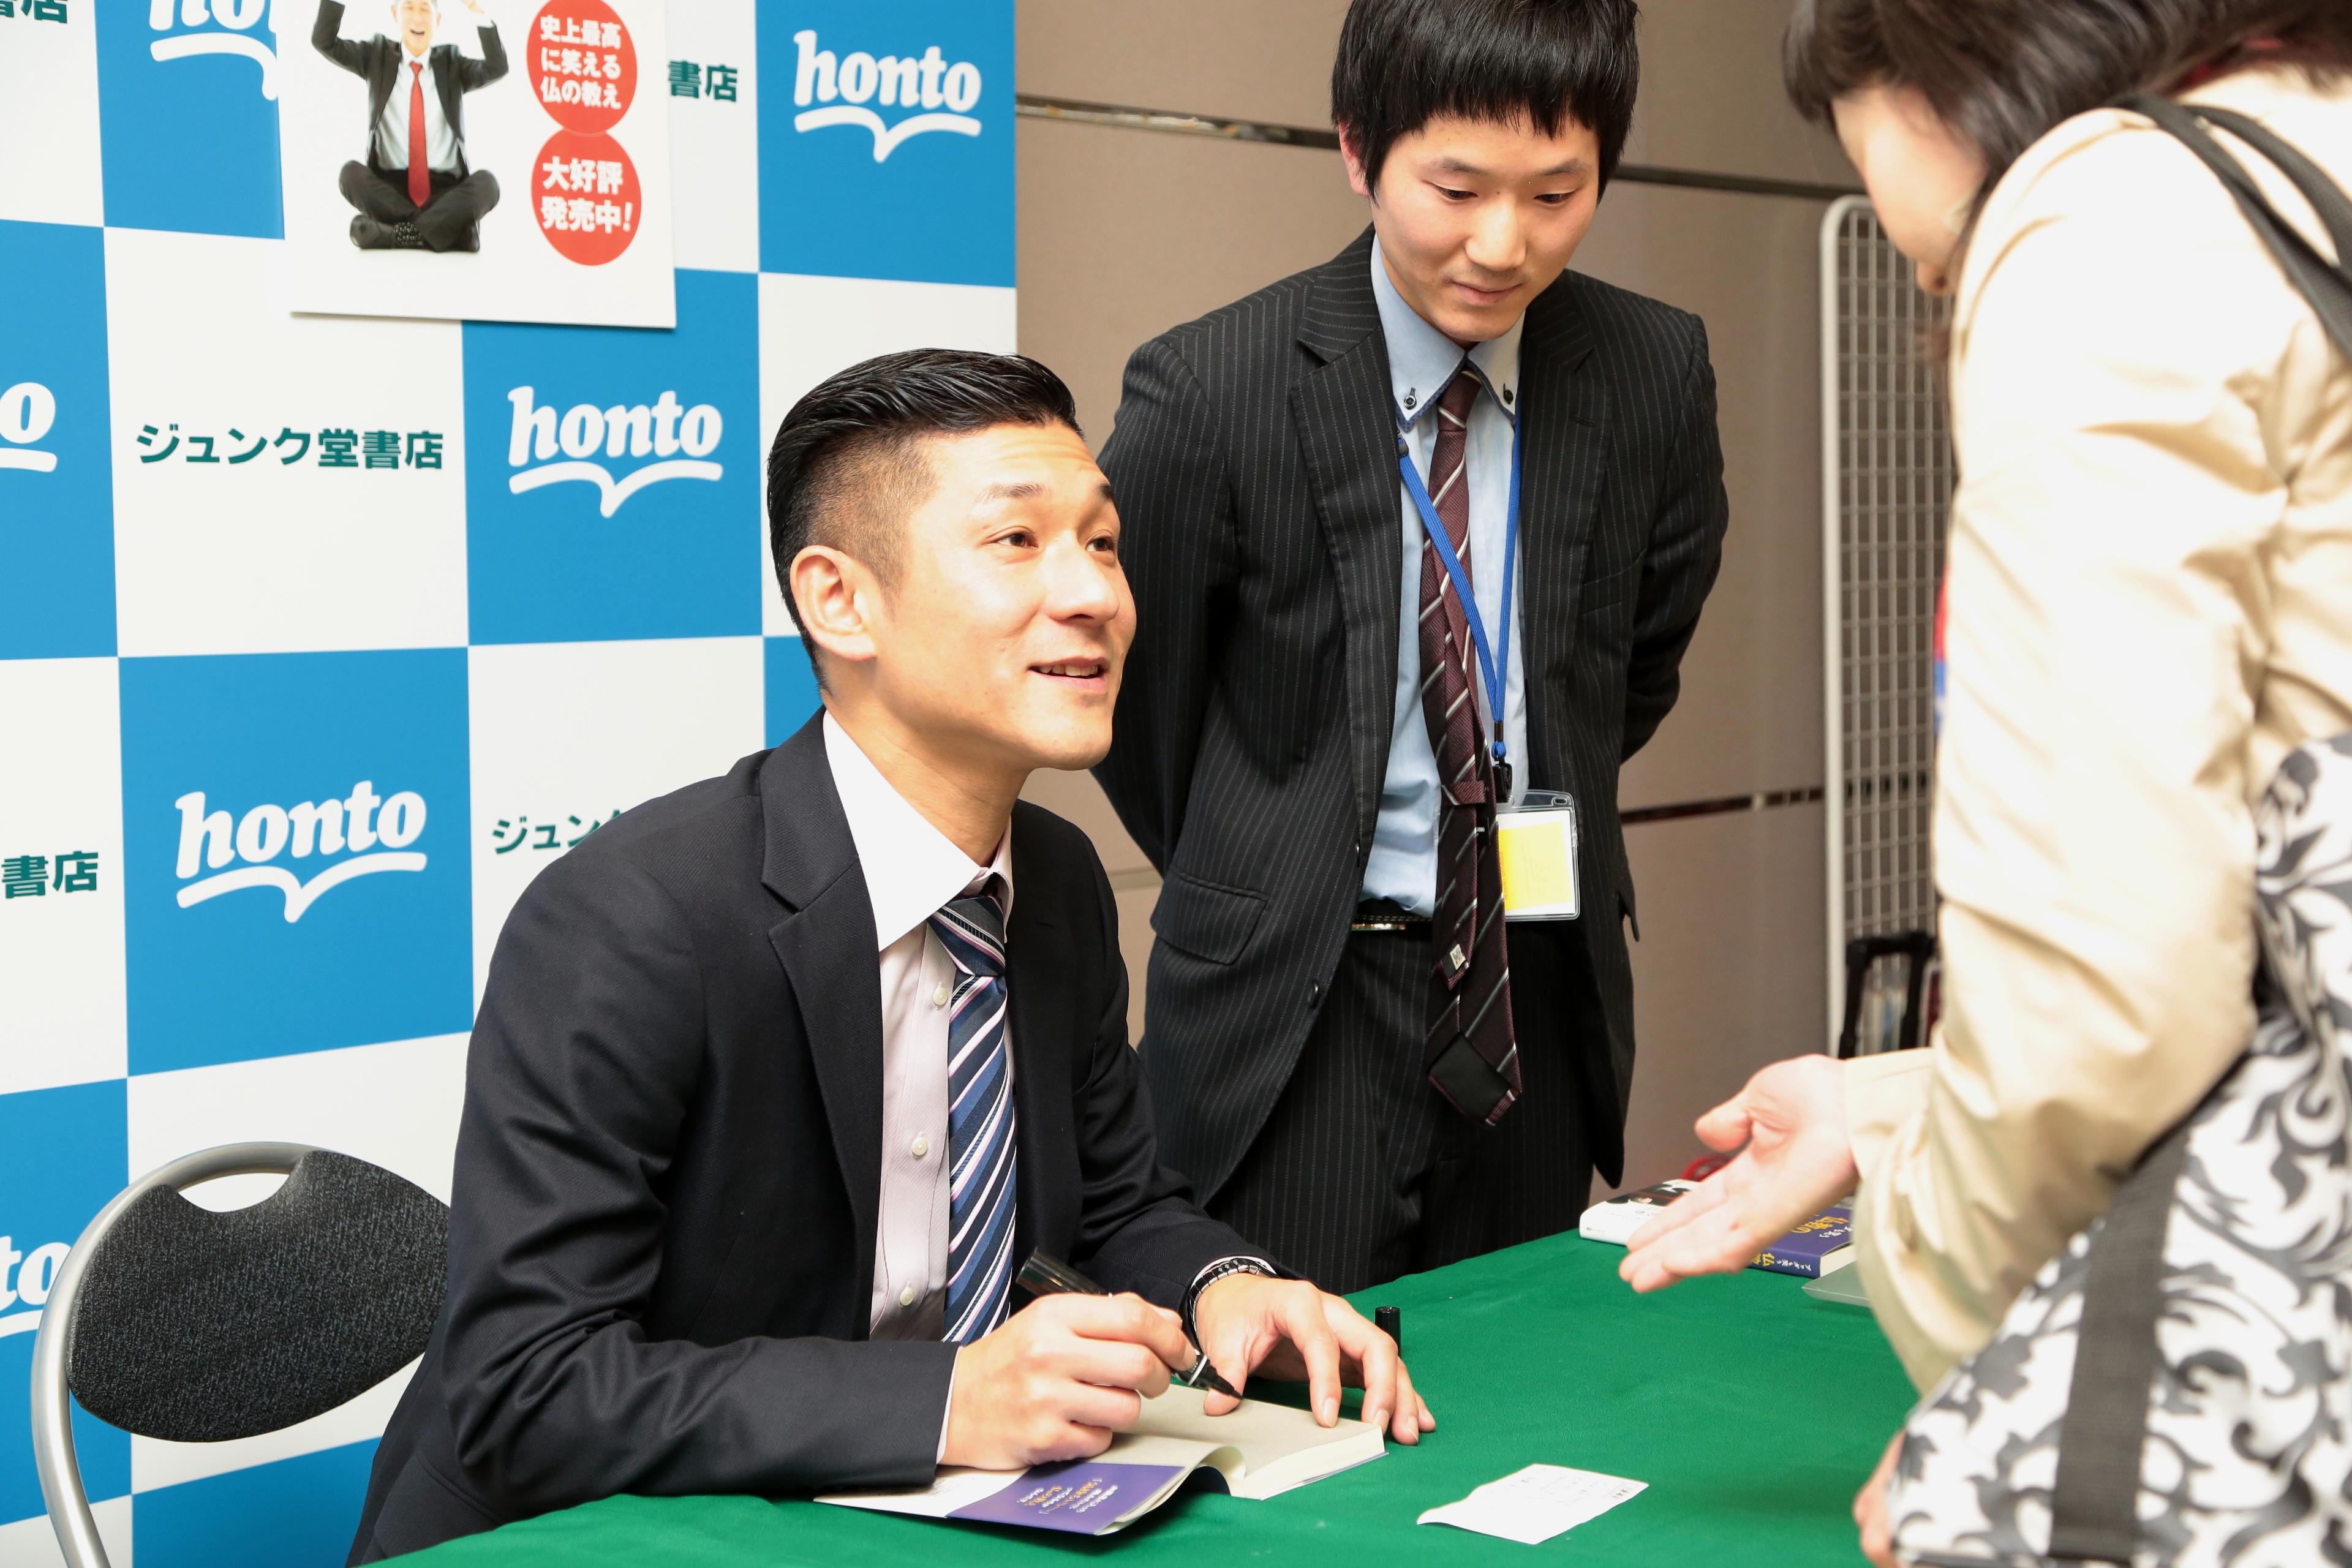 http://news.yoshimoto.co.jp/20160119235643-17d43dc29222aacbcad8eae8a33a6861d1f6cae2.jpg